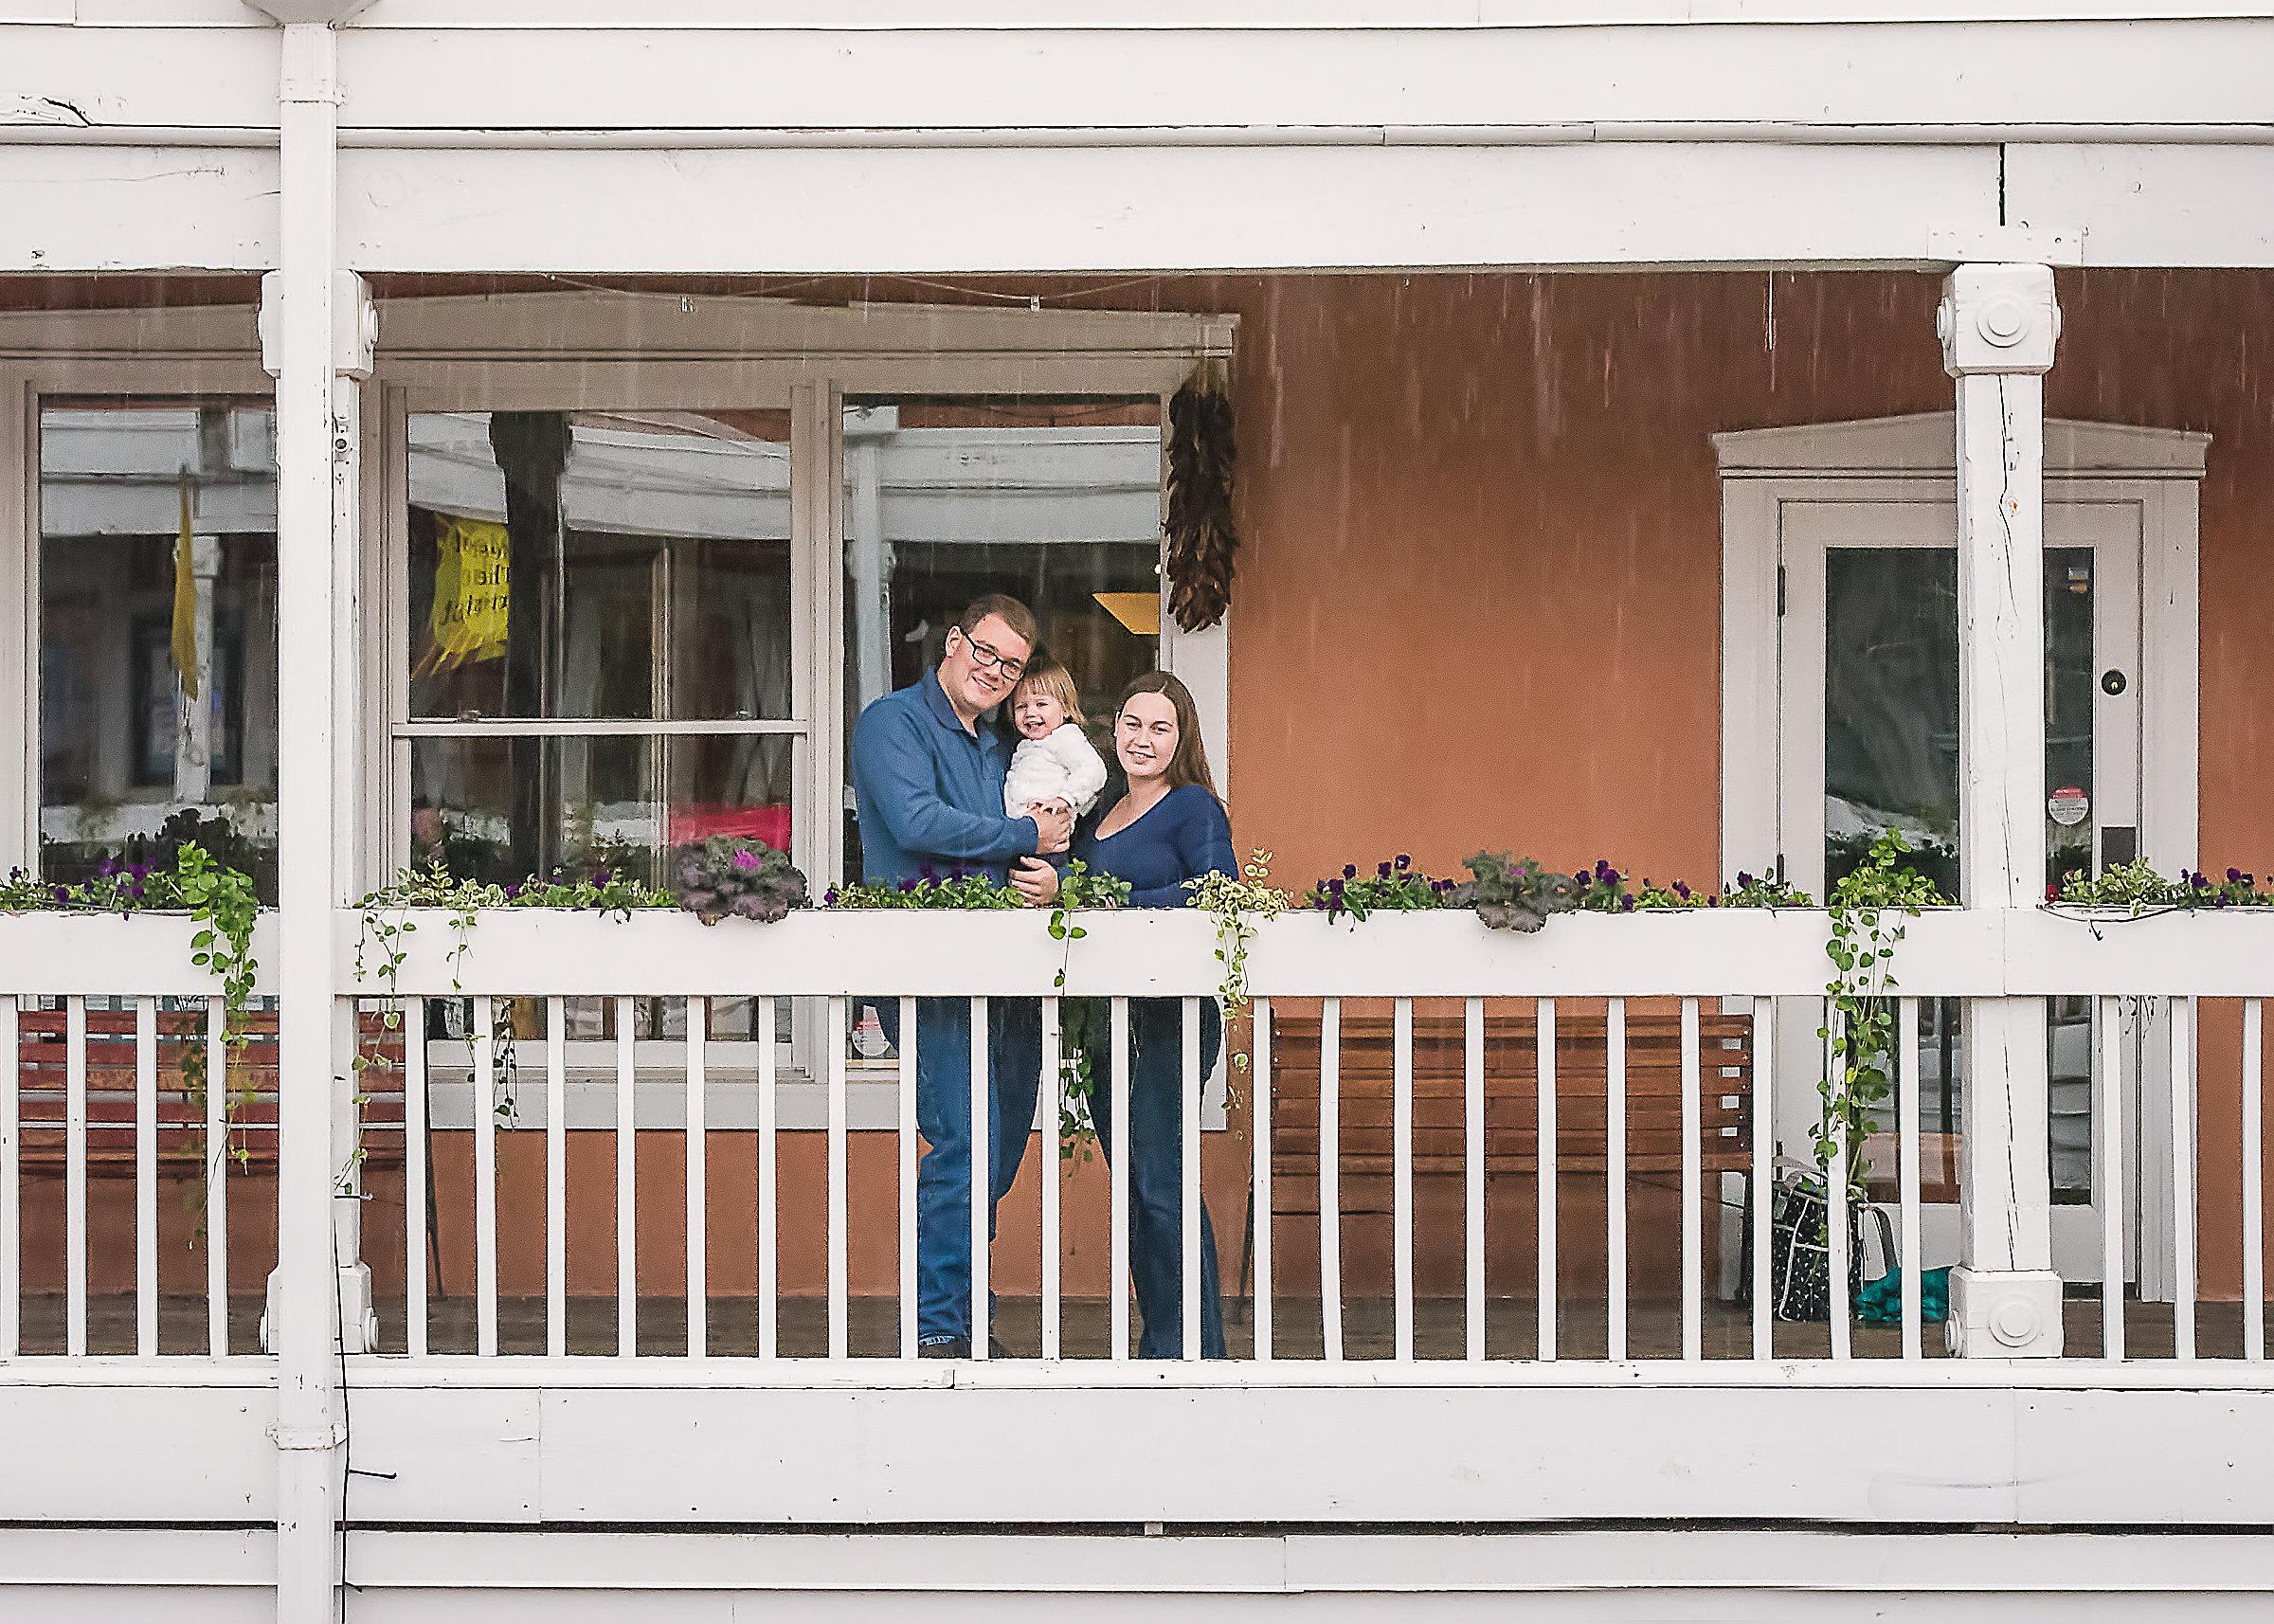 © Nicole Bradshaw Photography 2015; The Strickland Family- An Albuquerque, New Mexico Maternity Portrait Session; Albuquerque Maternity Photographer, New Mexico Maternity Photographer, Los Lunas Photographer, Albuquerque Photographer, Santa Fe Photographer, Southwest Family Photographer